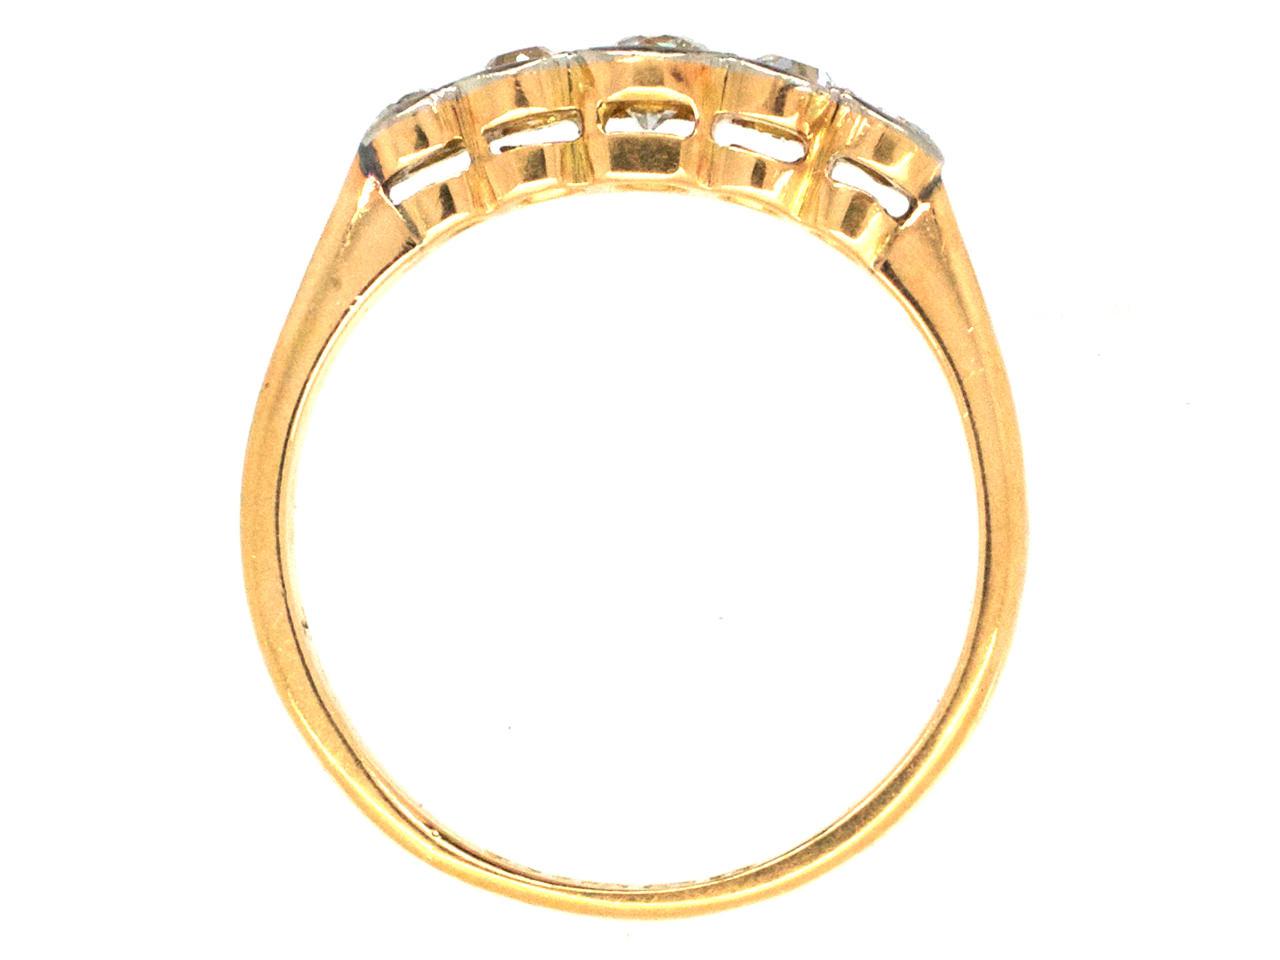 Edwardian Five Stone Diamond Ring